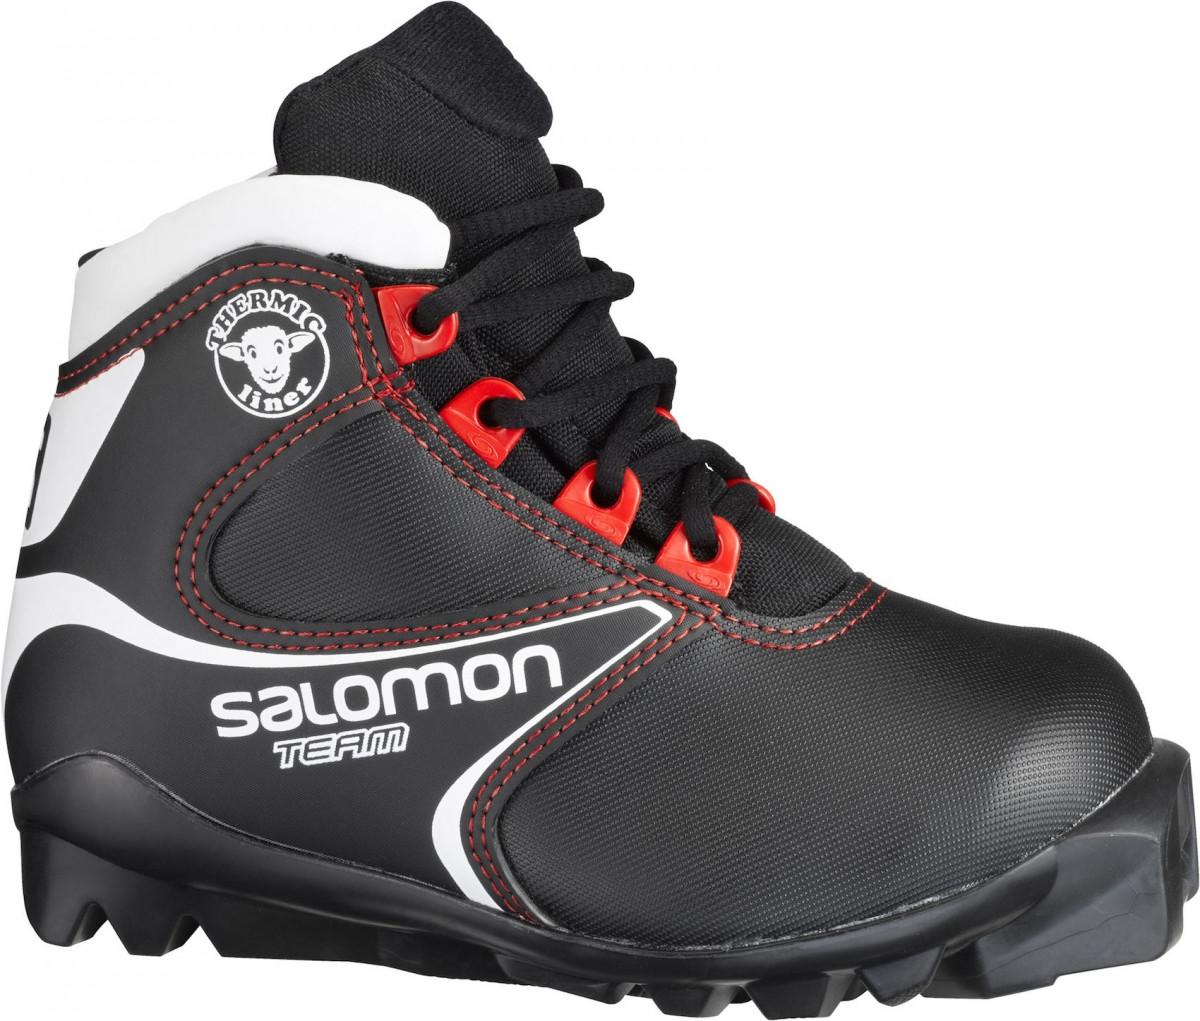 Salomon Team